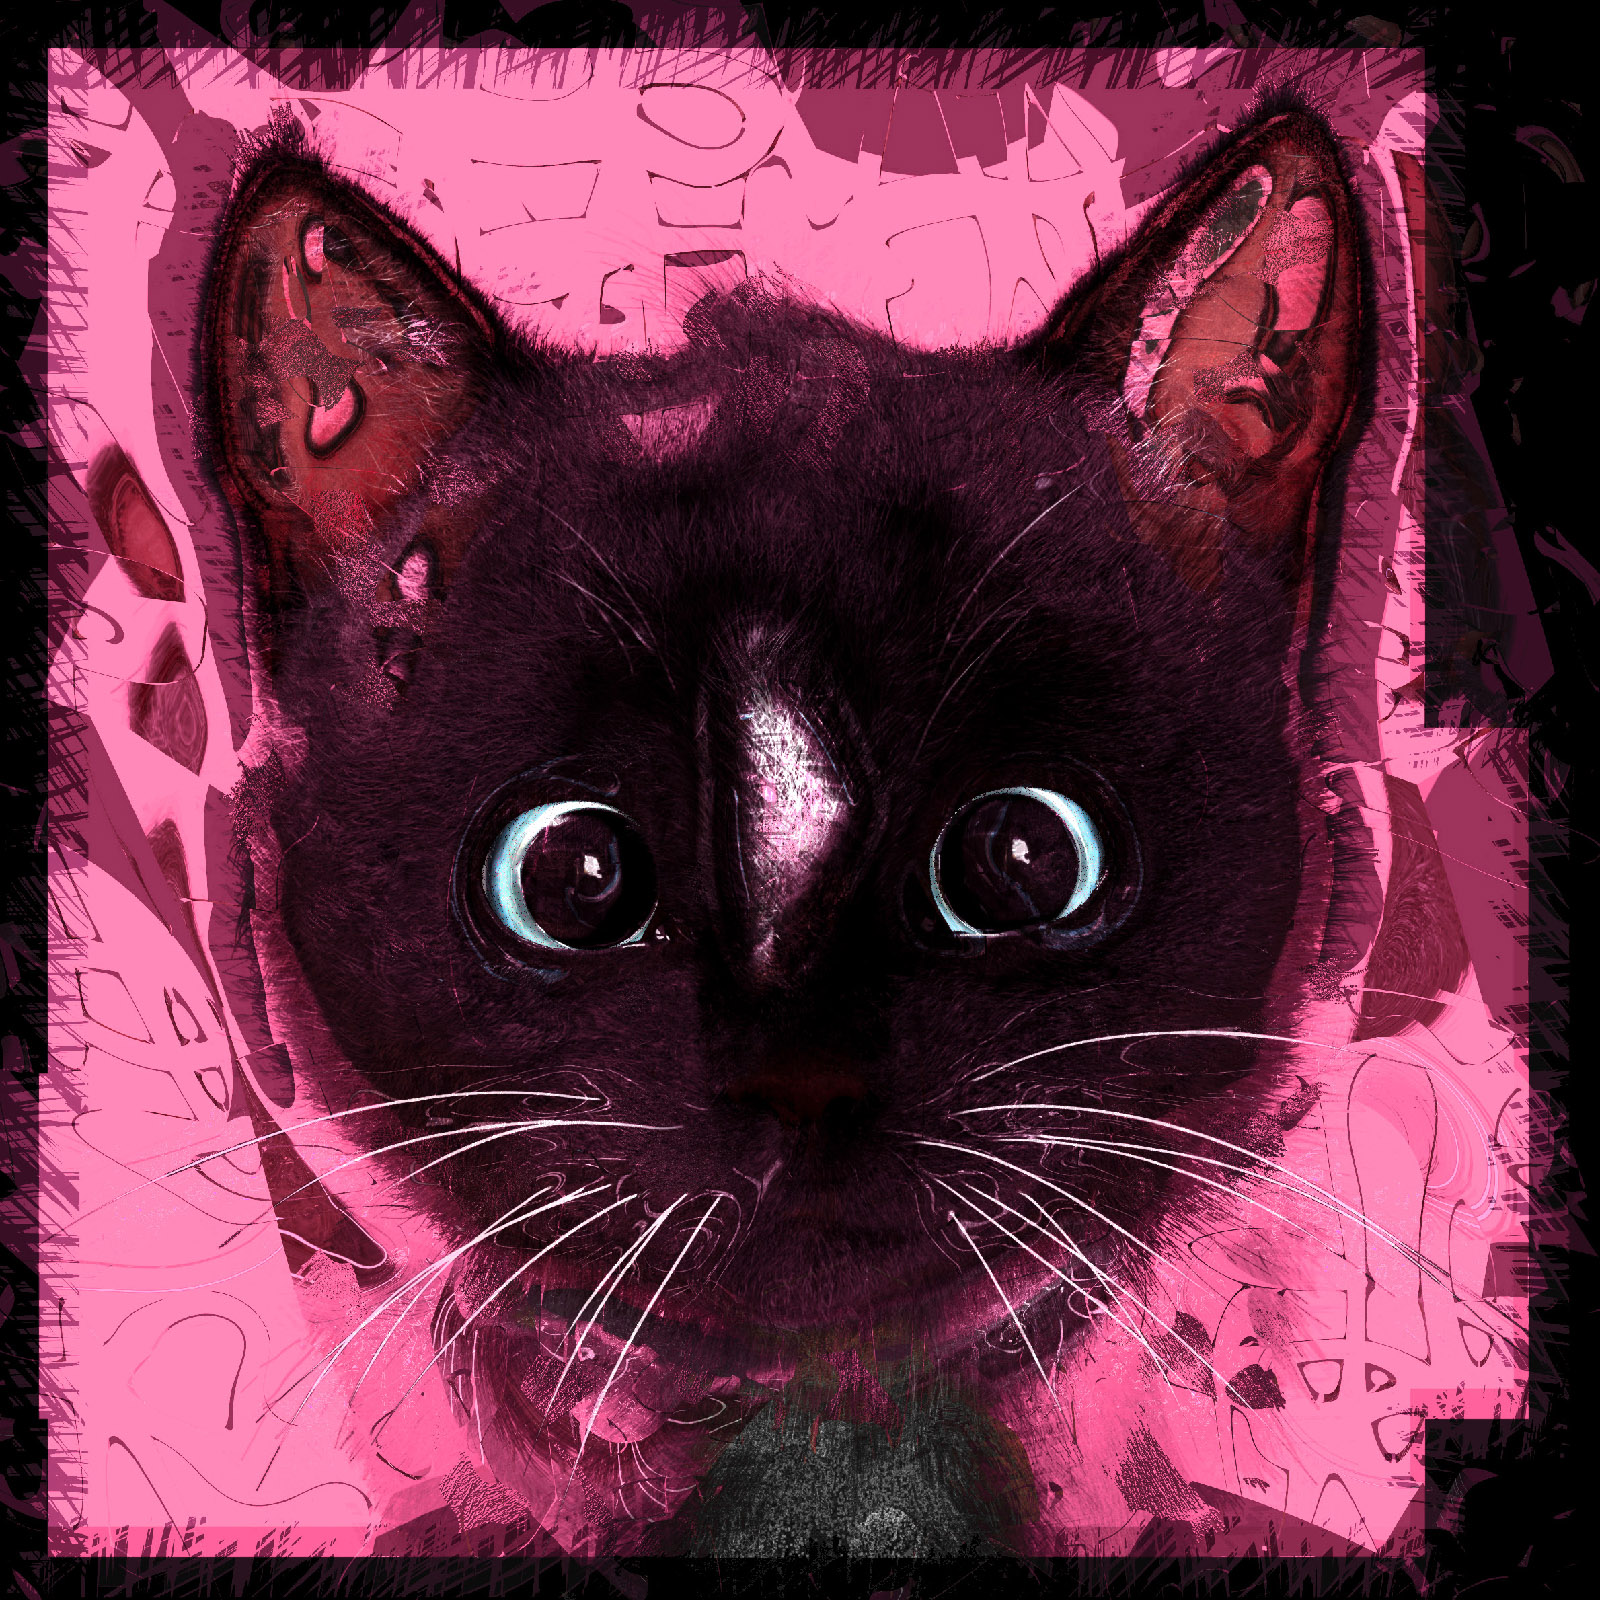 Feline cat chemistry with Felini the Cat